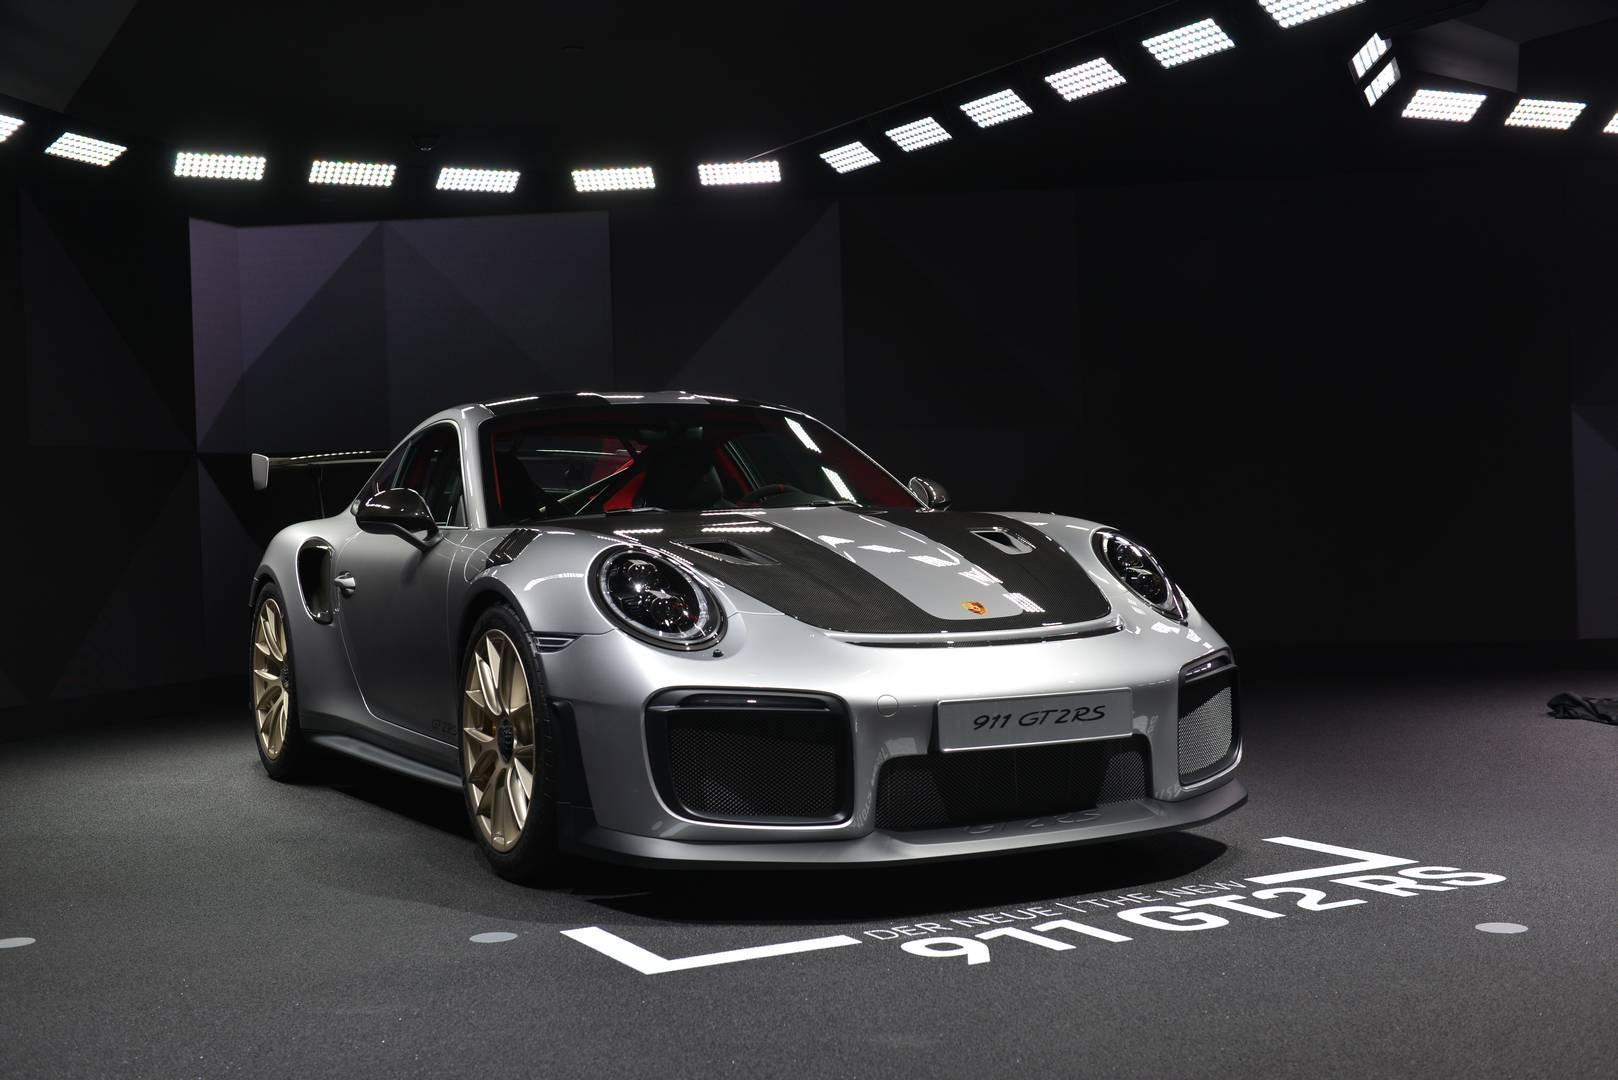 2018 Porsche 911 GT2 RS Eyes Nurburgring Record in Fresh